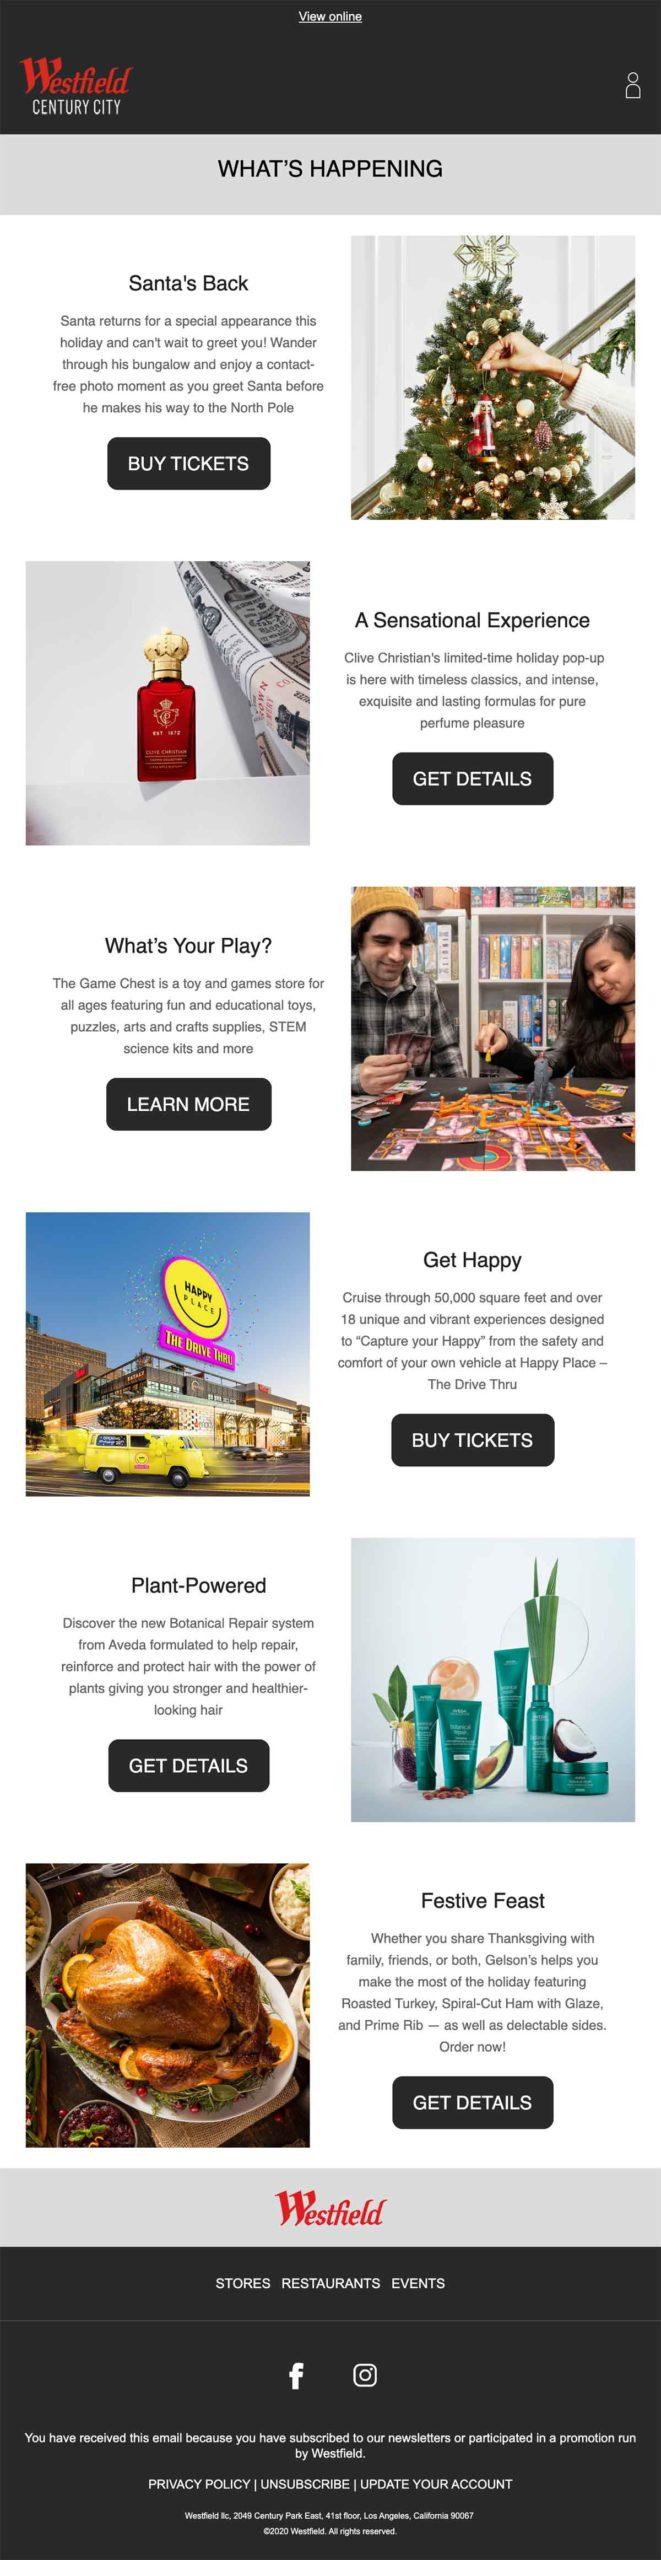 Westfield Malls Holiday 2020 Newsletter